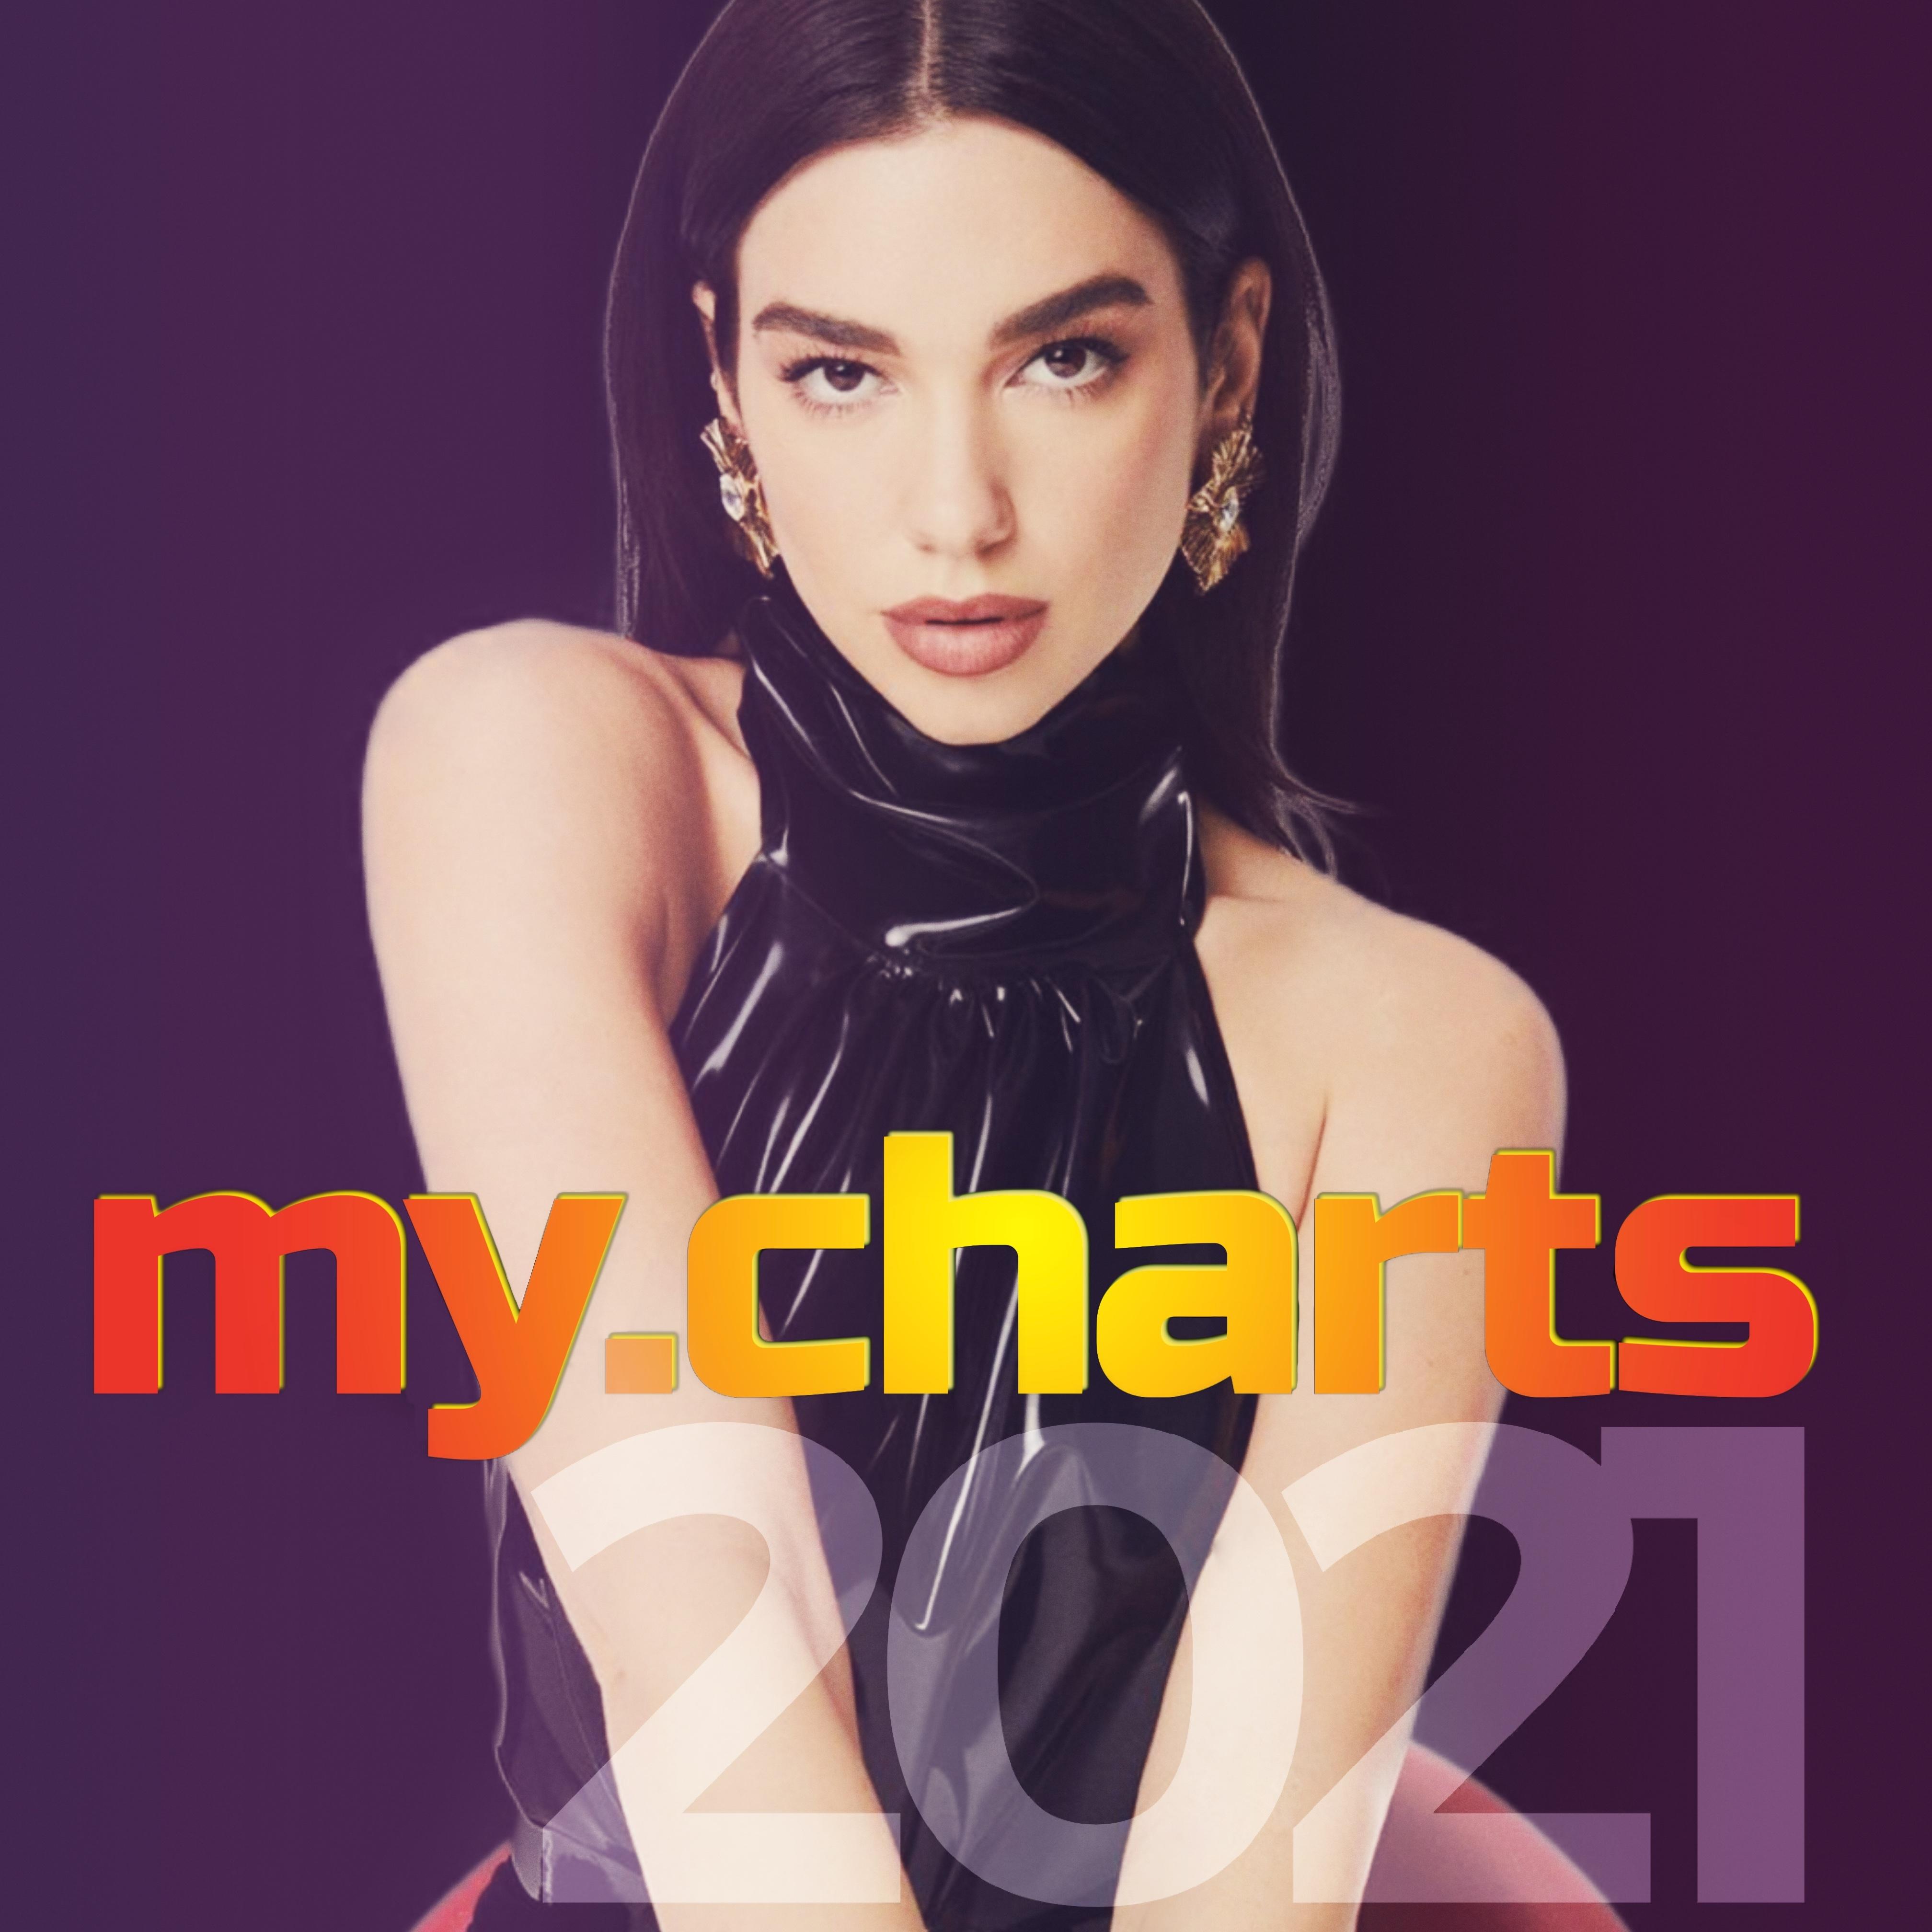 Charts 2021 Image